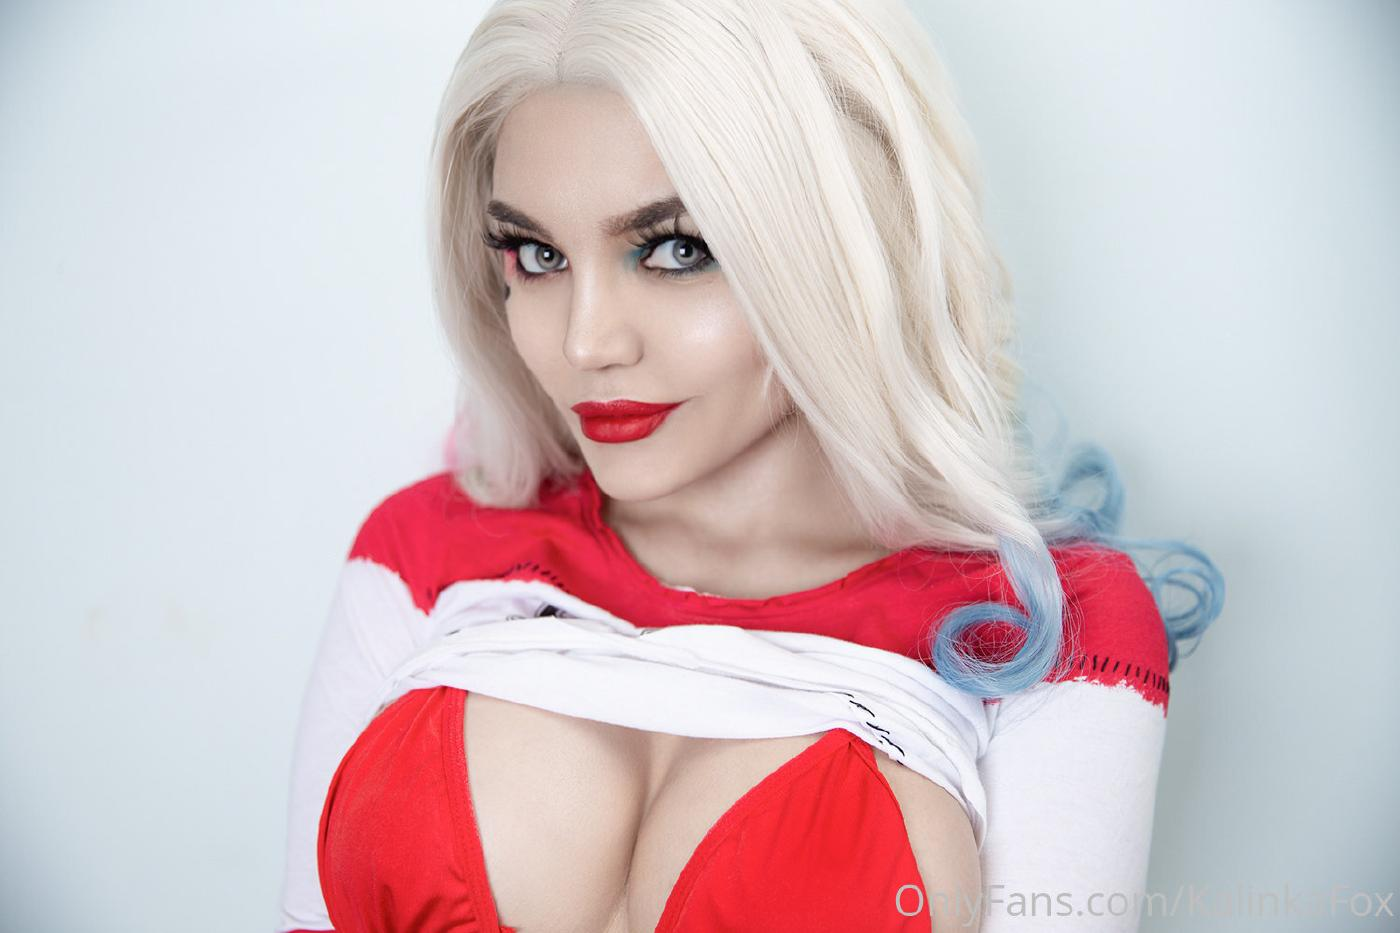 Kalinka Fox Harley Quinn Nude Cosplay Set Leaked 14